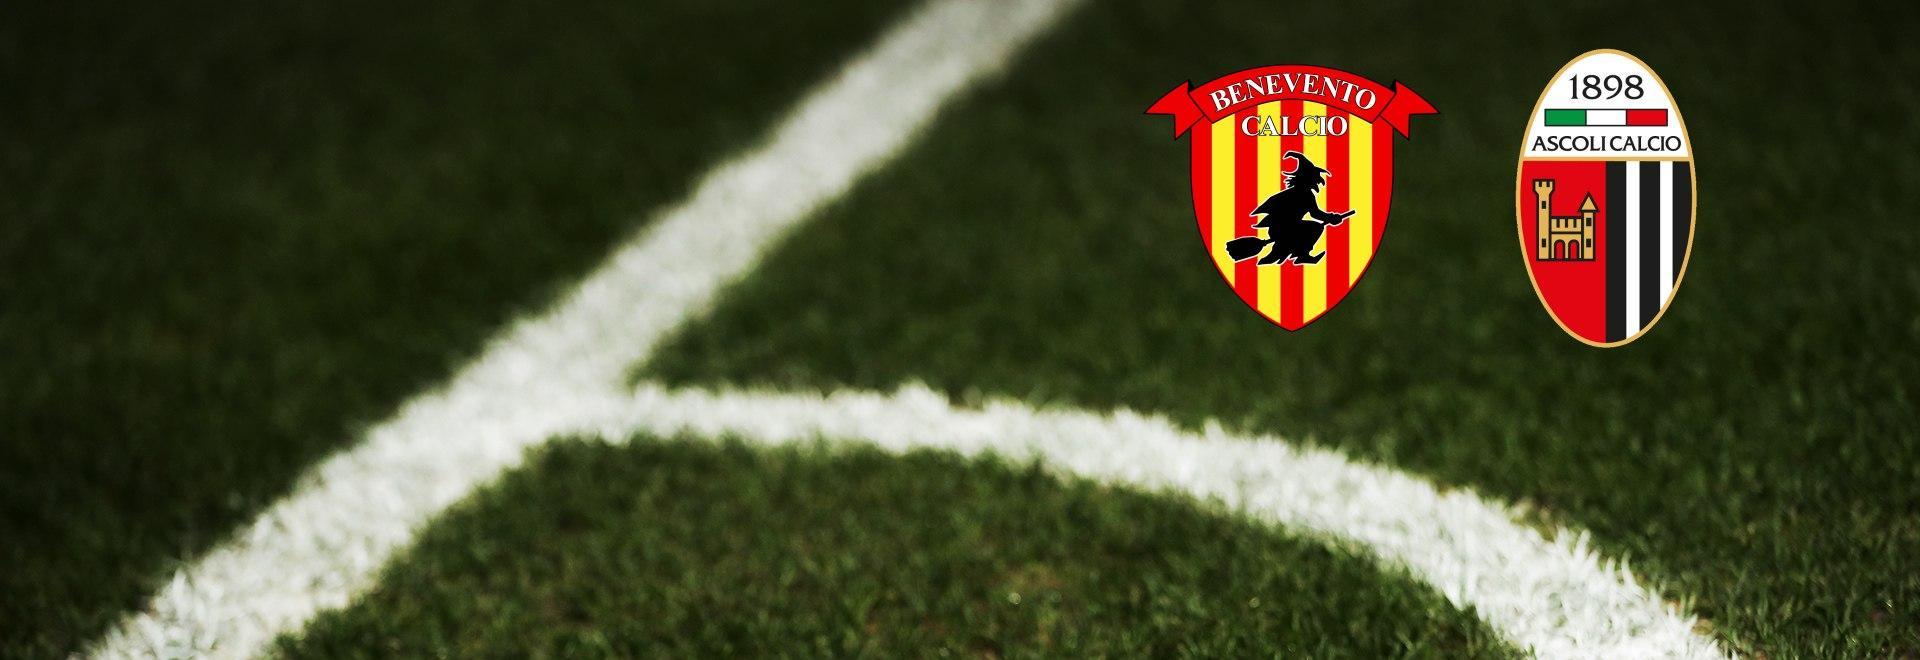 Benevento - Ascoli. 19a g.